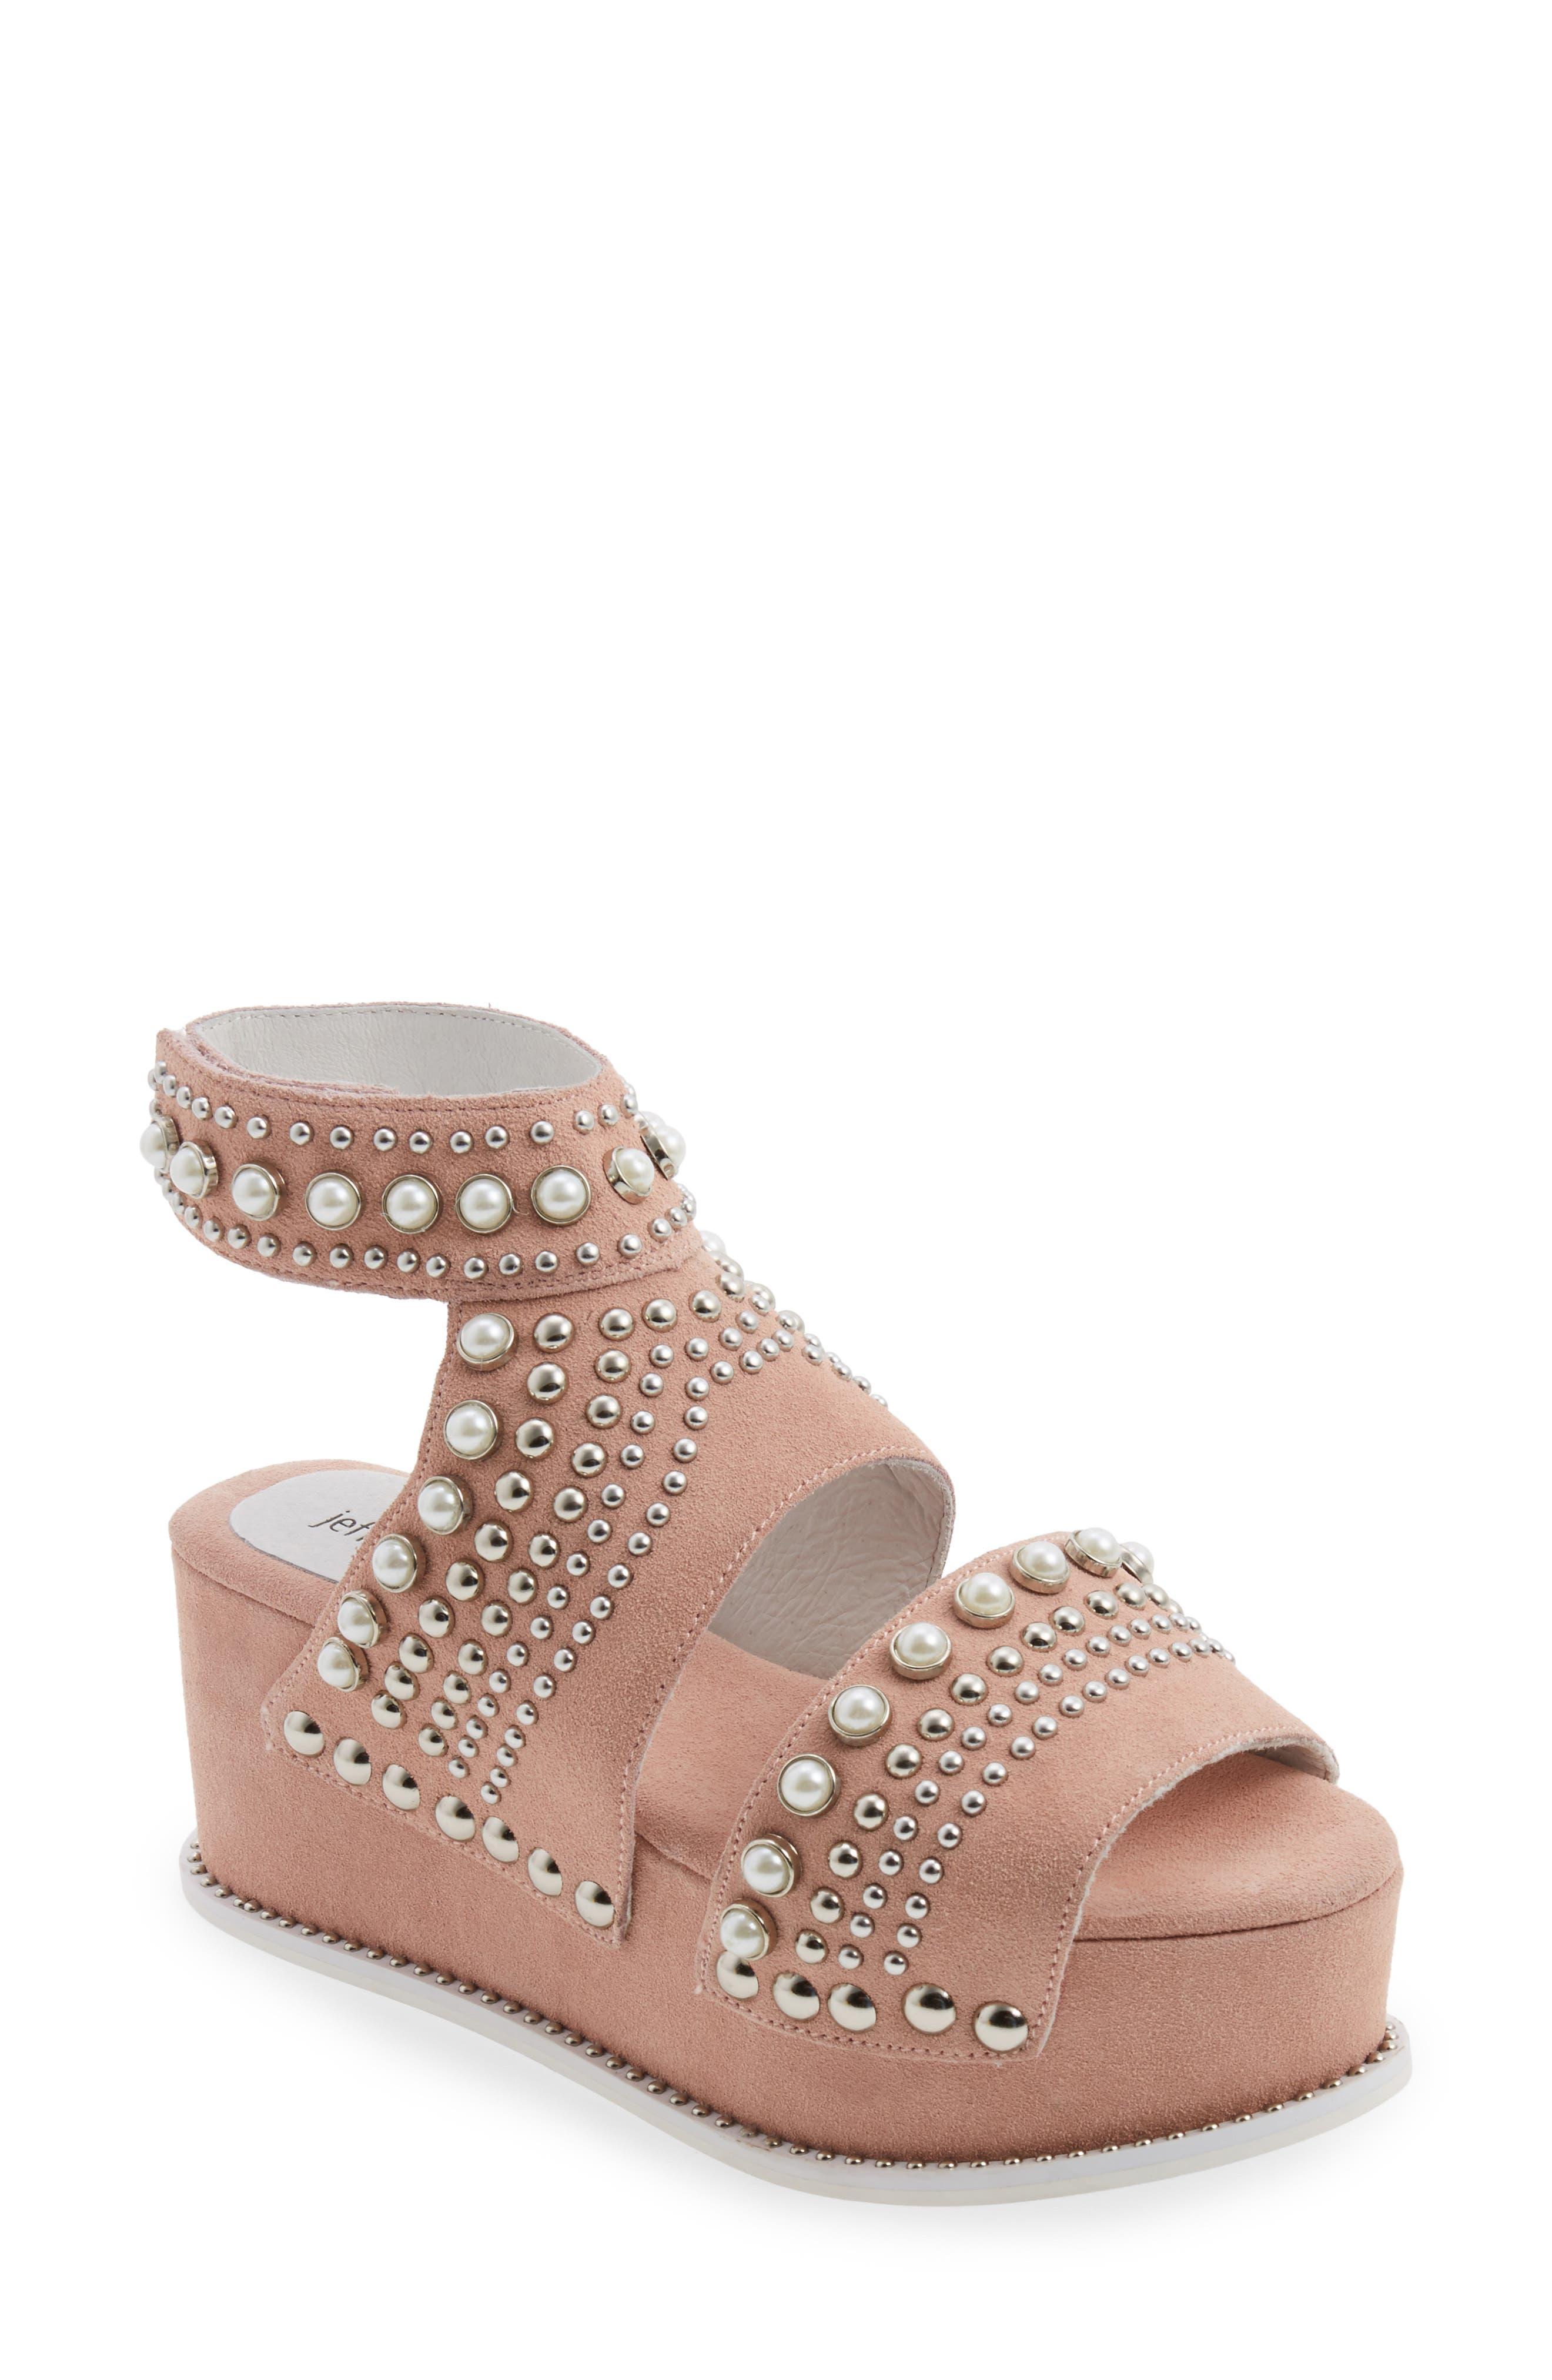 Main Image - Jeffrey Campbell Palmira Embellished Platform Sandal (Women)